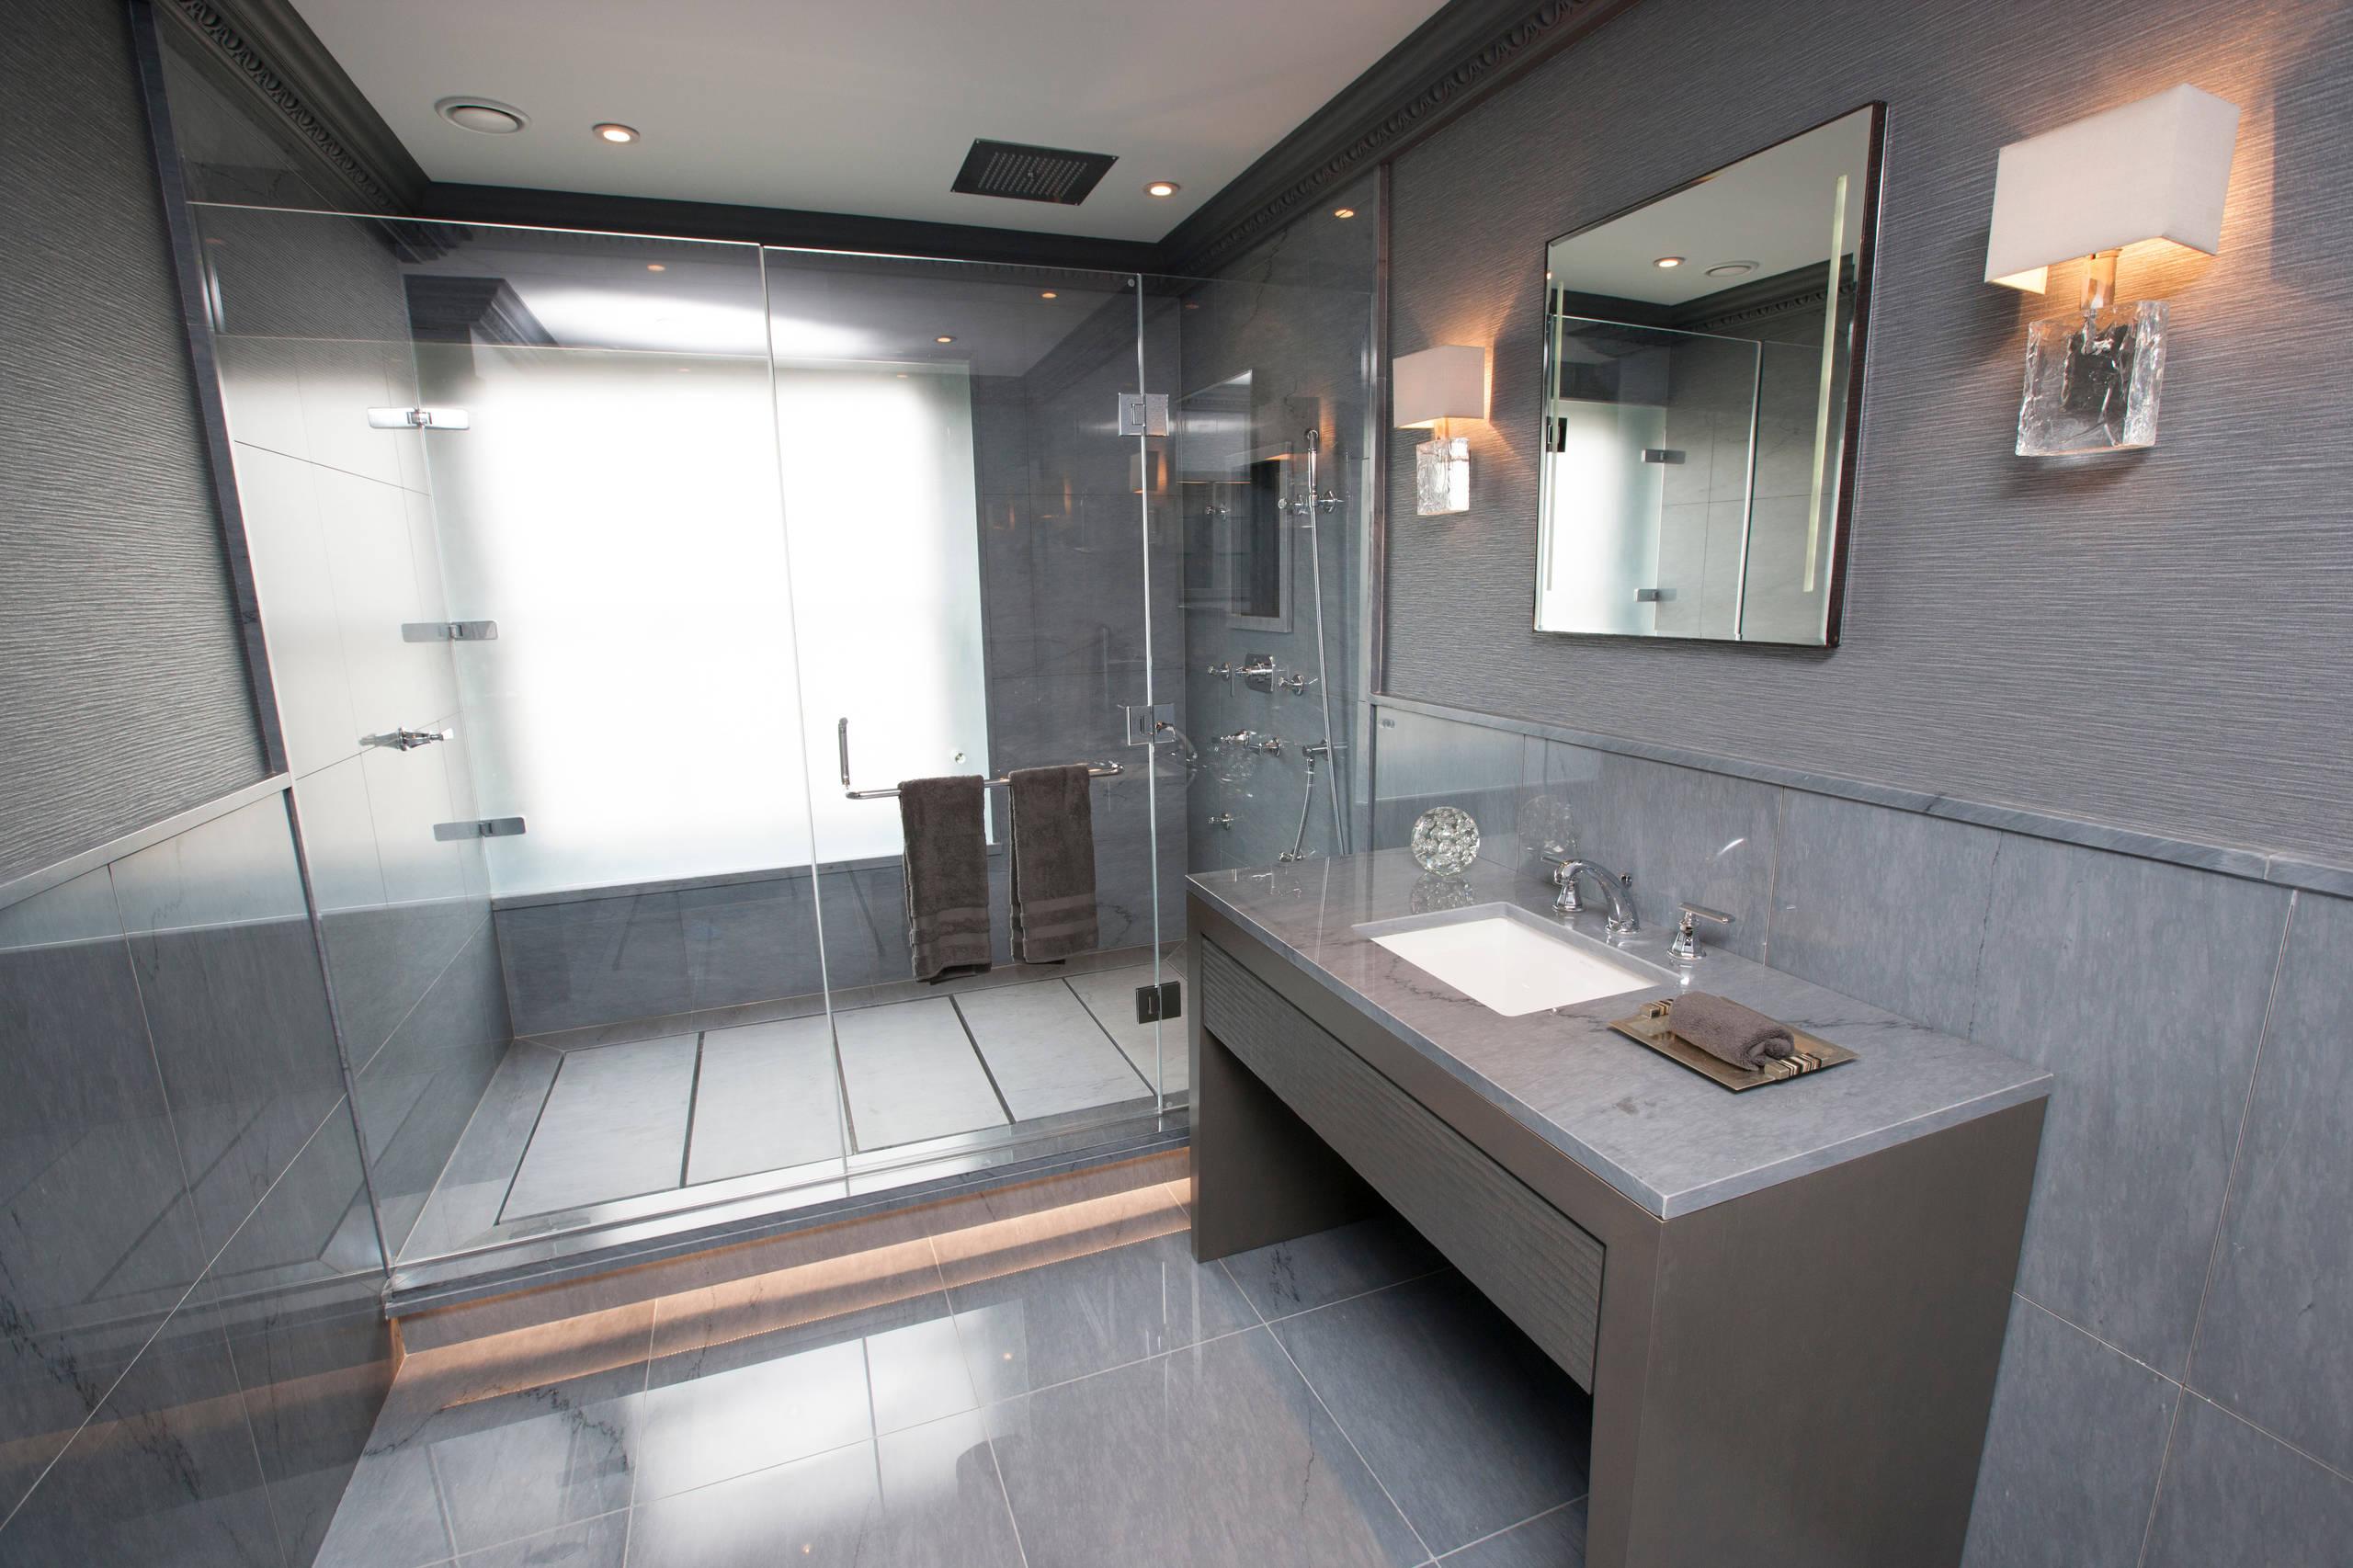 False Ceiling Bathroom Ideas & Photos  Houzz